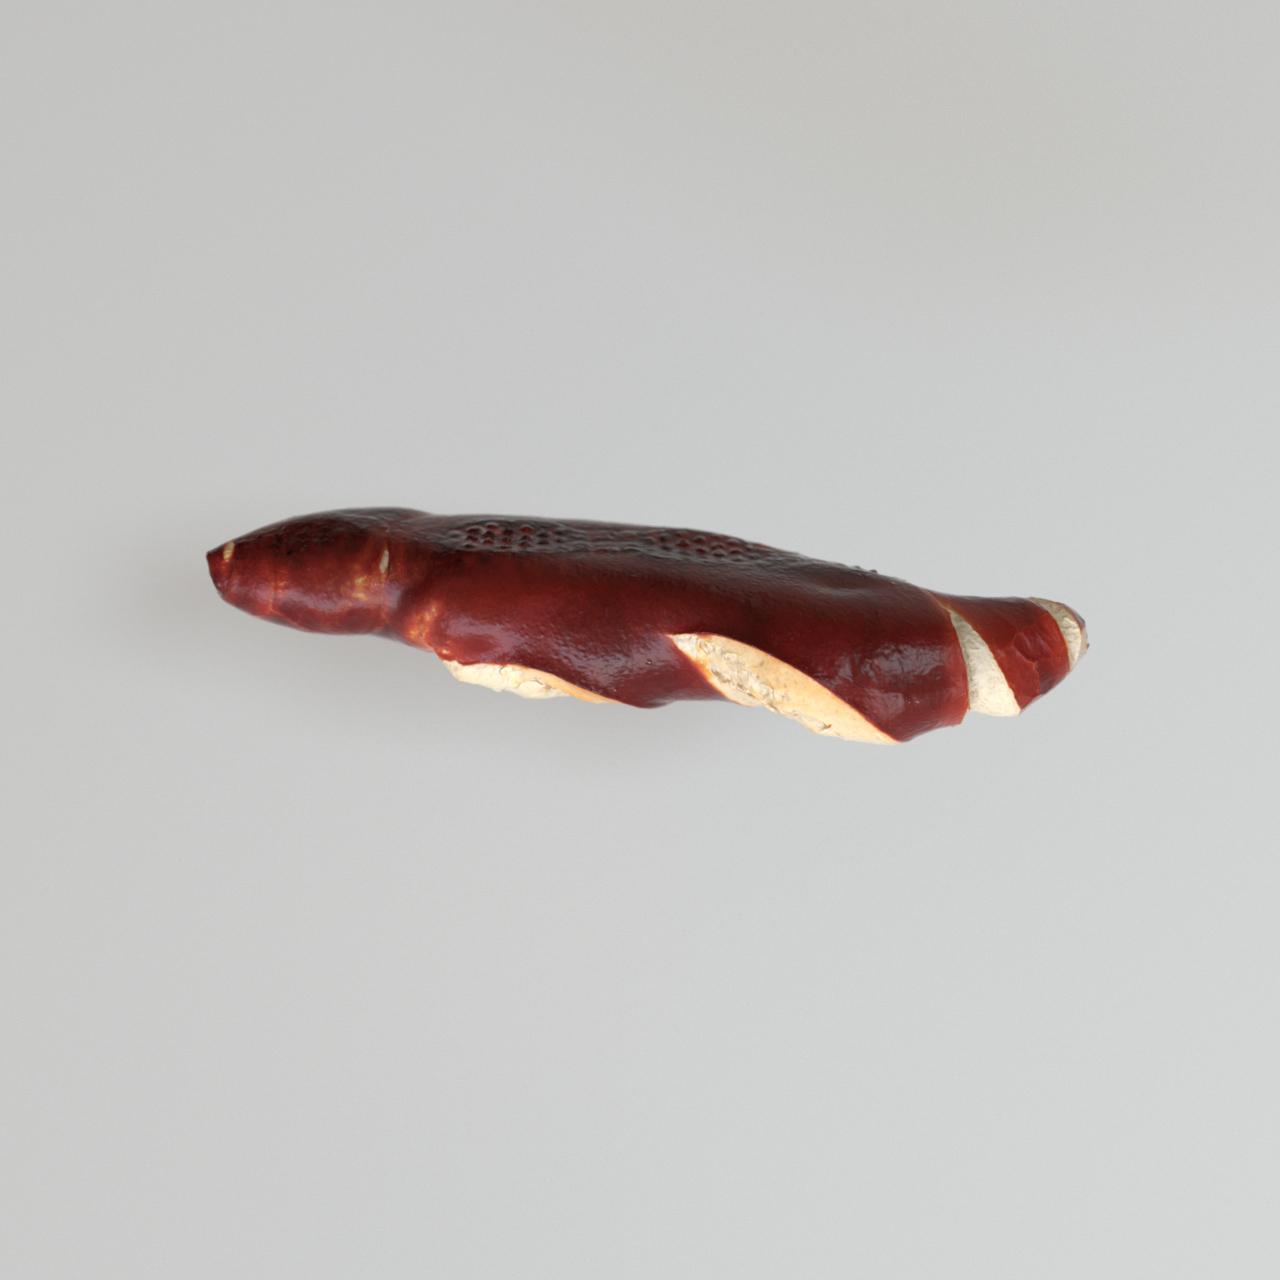 Eder Stefan Laugenstangerl 3D Rendering Gebäck Visualisierung Brot Linz